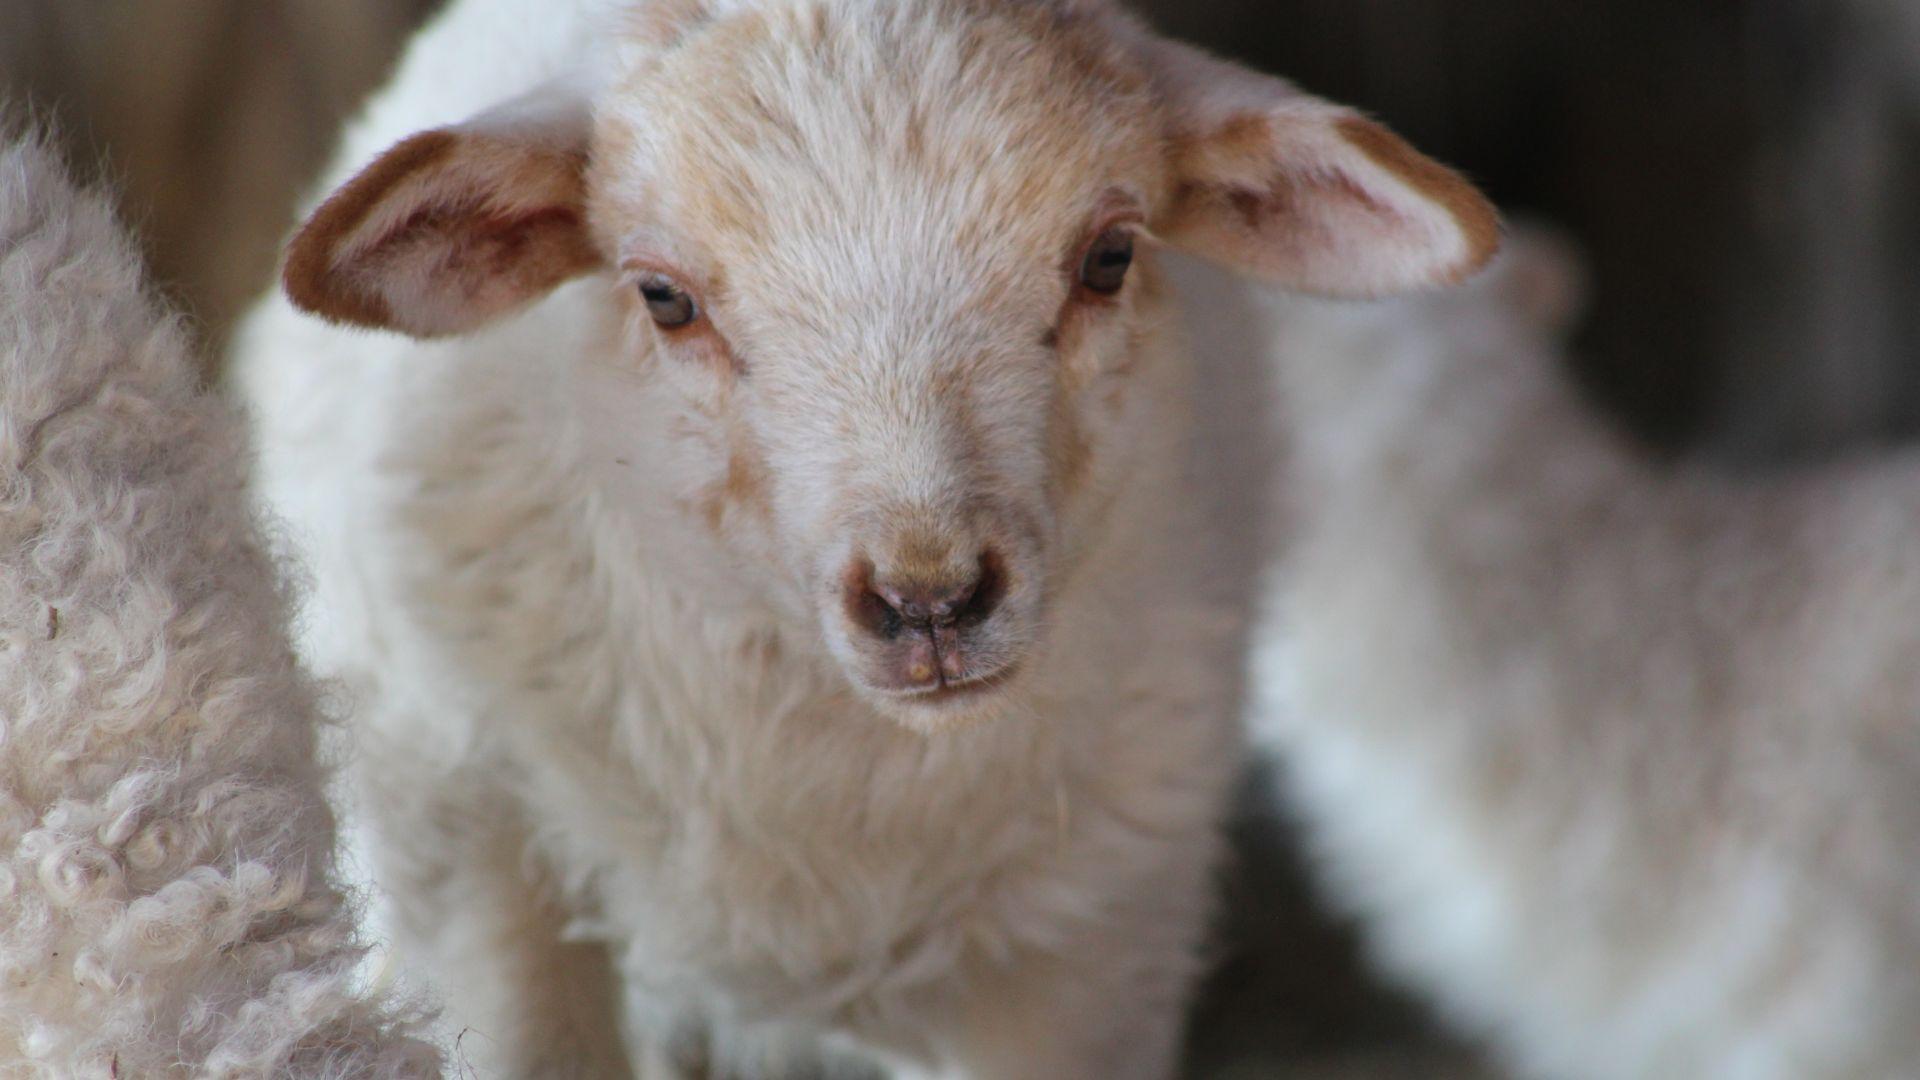 Cute Baby Sheep Lamb White Animal Wallpaper